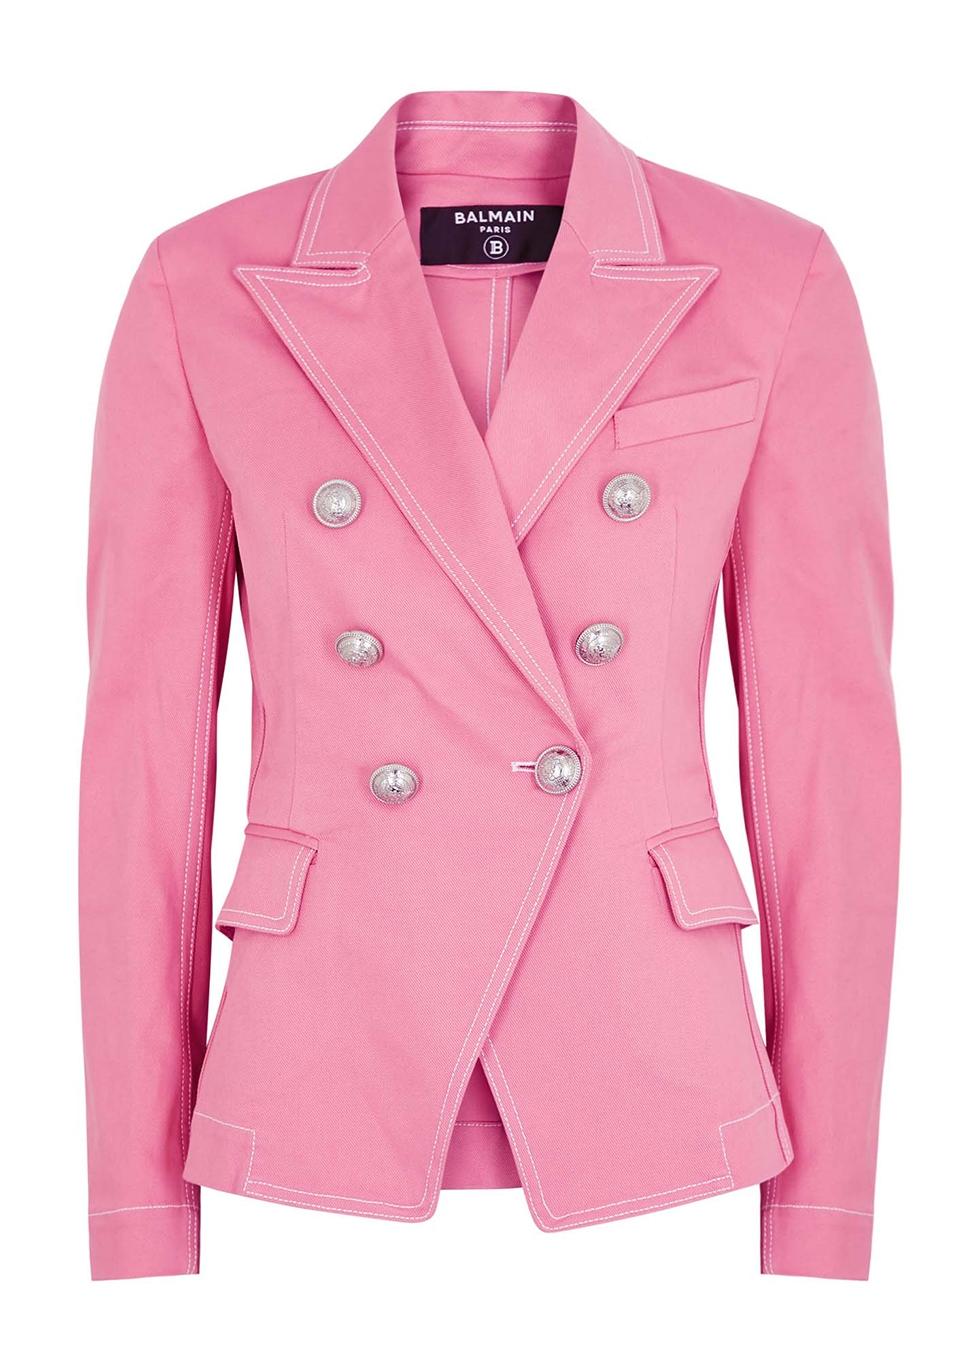 Pink double-breasted denim blazer